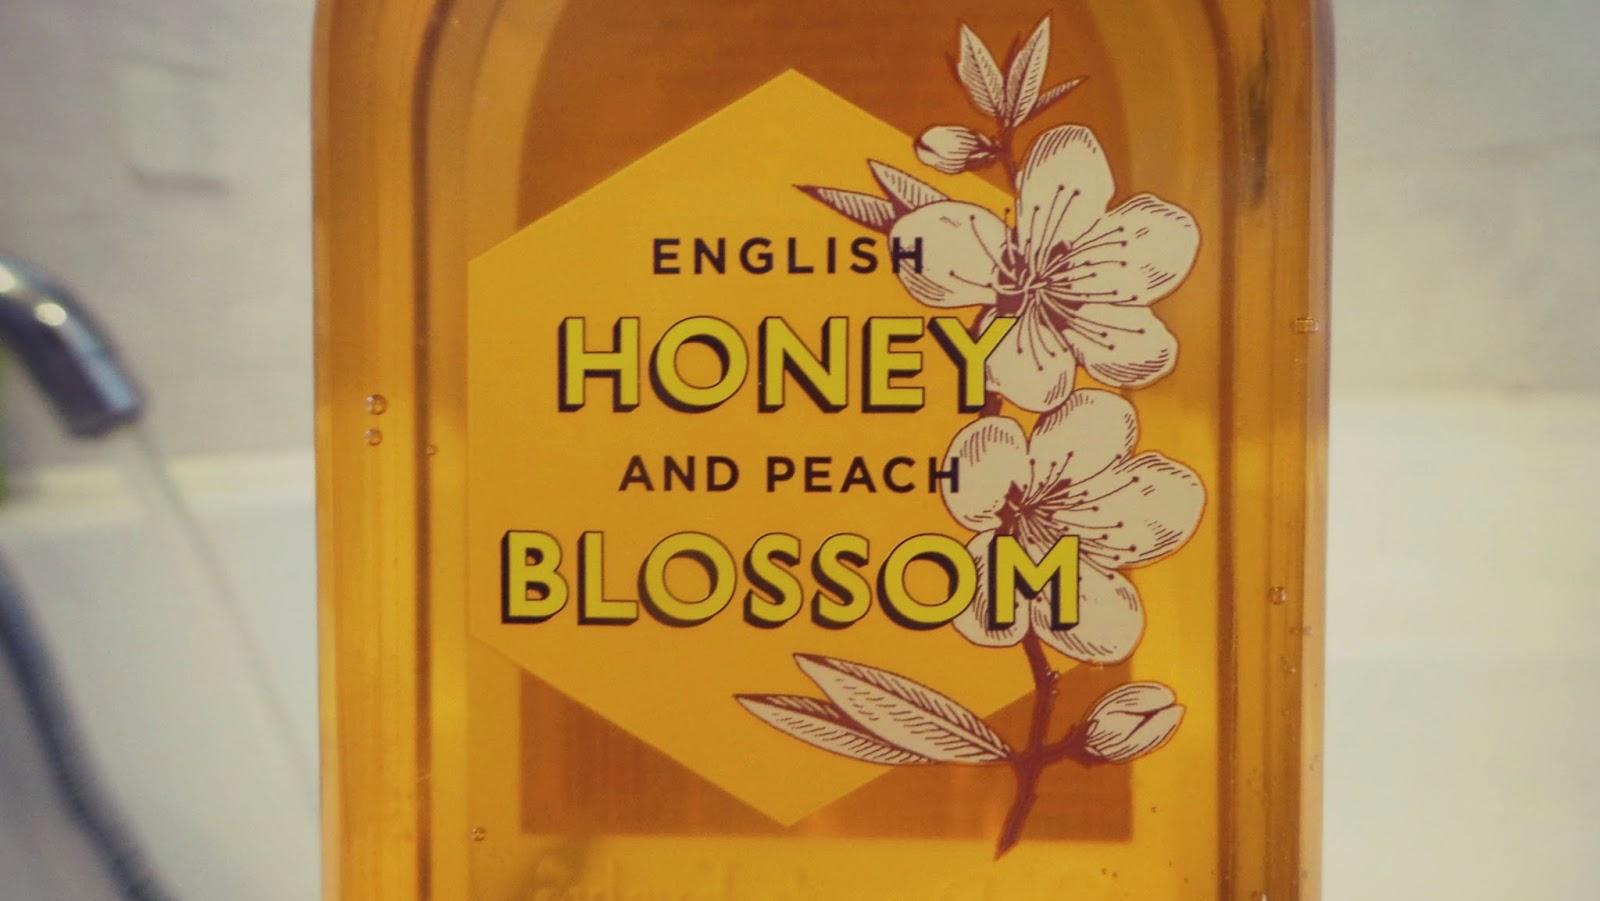 Honey bath bubbles